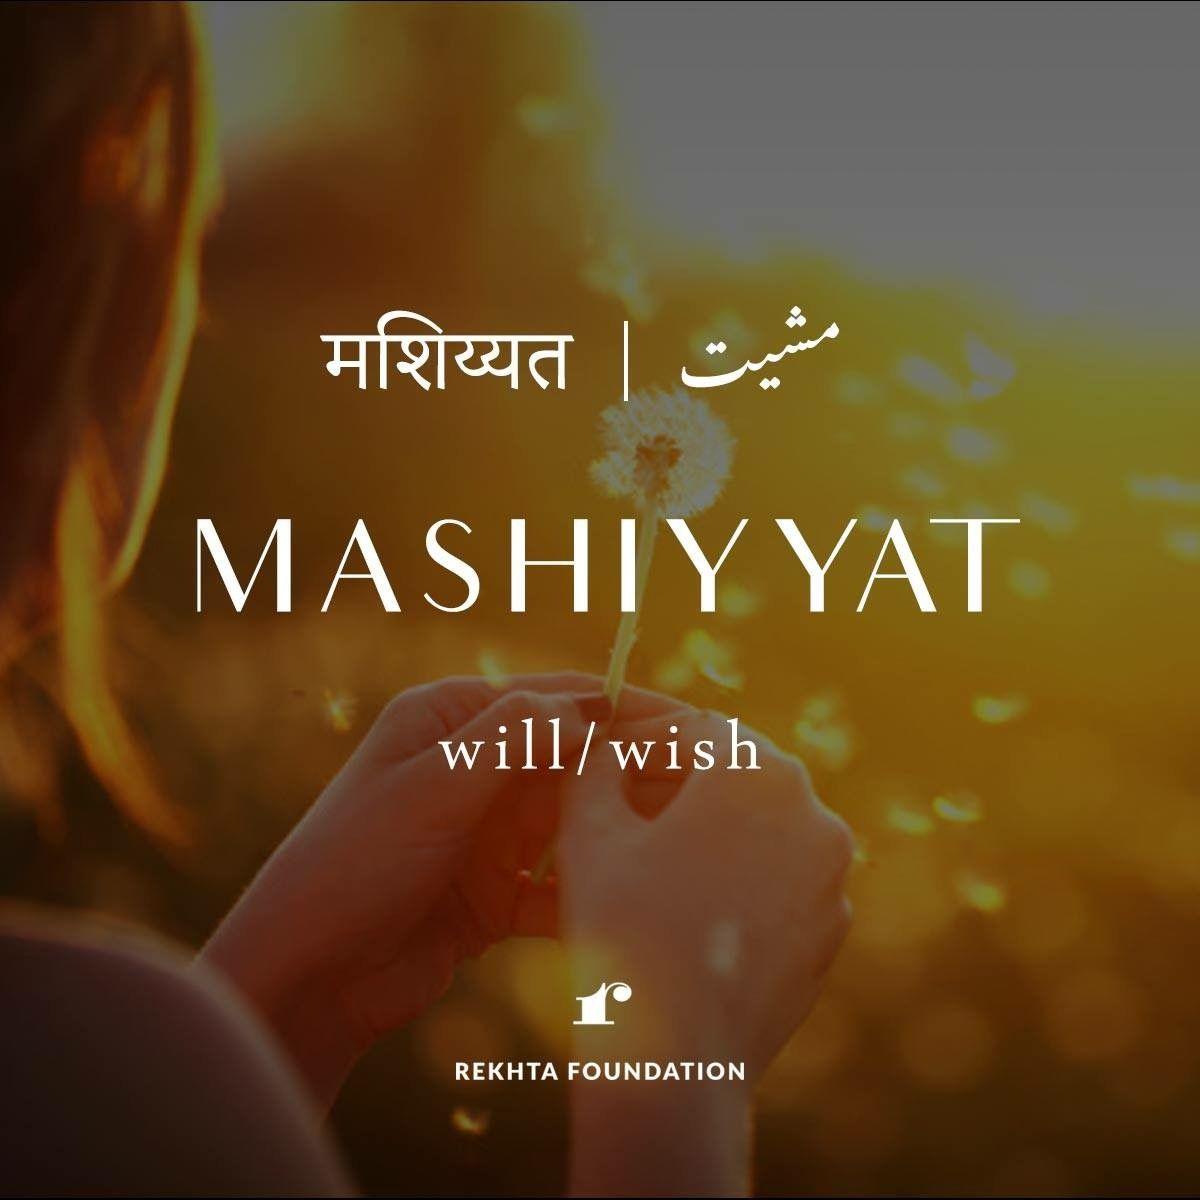 Http Www Loapower Net Our Story Hindi Words Urdu Love Words Urdu Words With Meaning